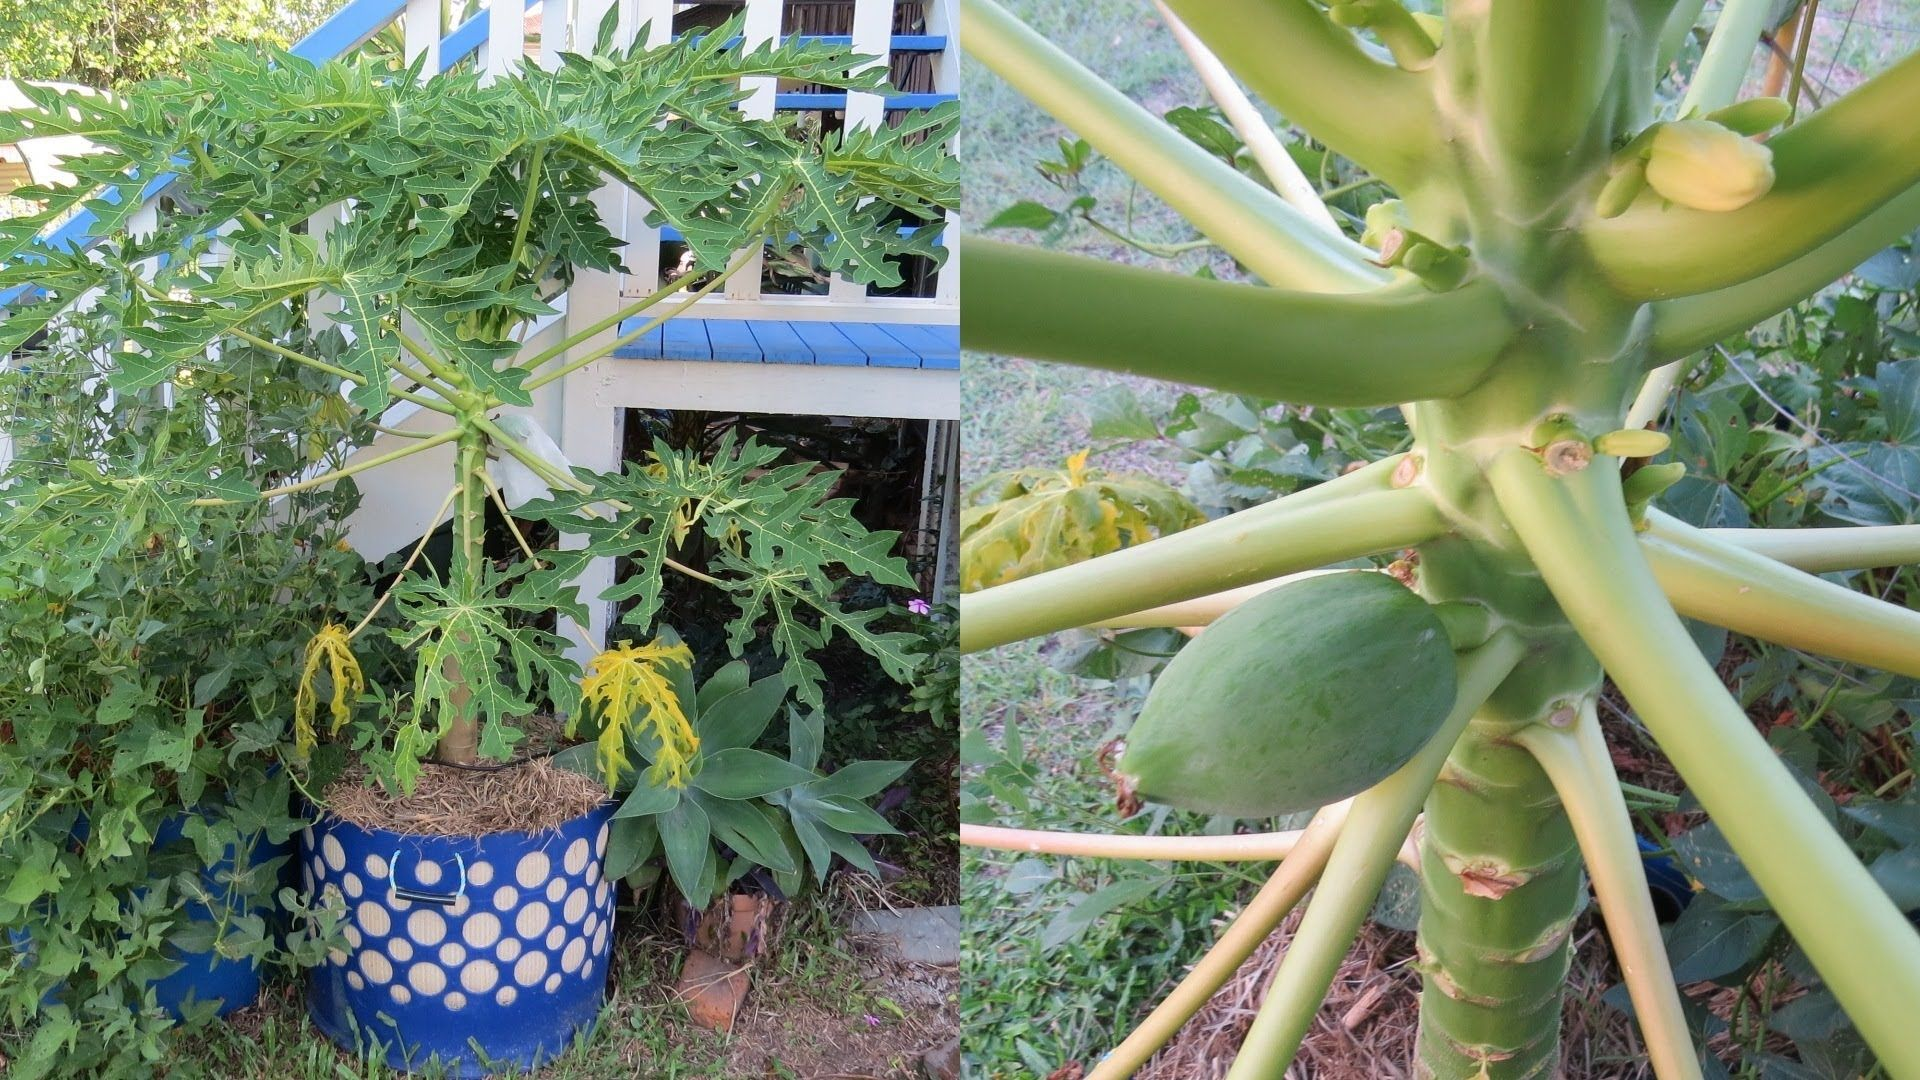 Pin By Mart Hale On Larry Hall S Hybrid Rain Gutter Grow System Papaya Tree Food Garden Prune